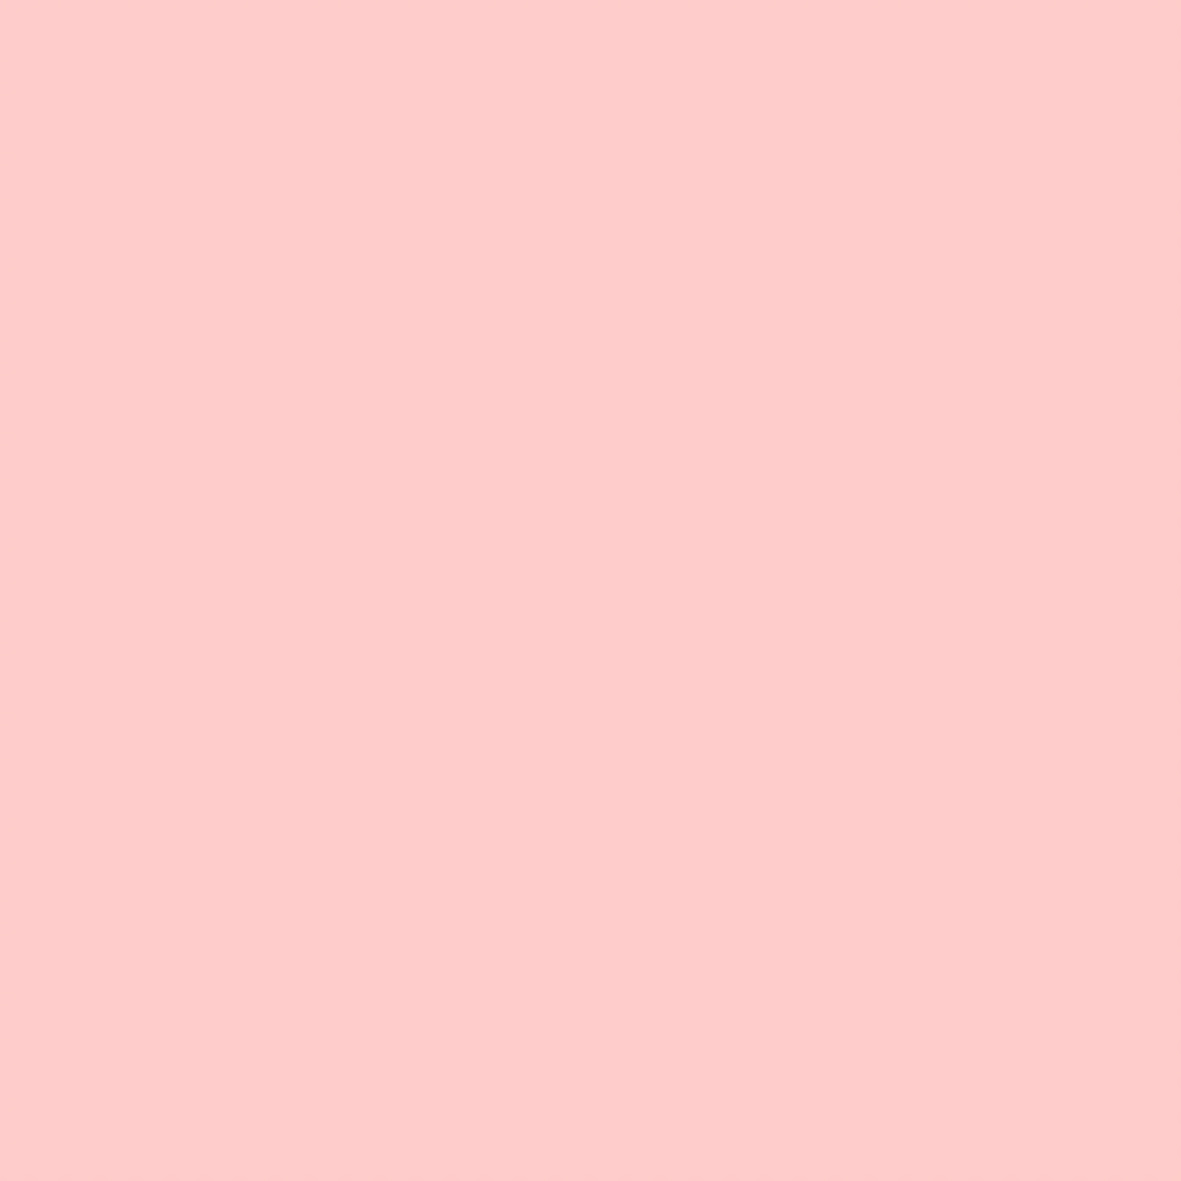 LY-KJ062浅玫瑰红.jpg